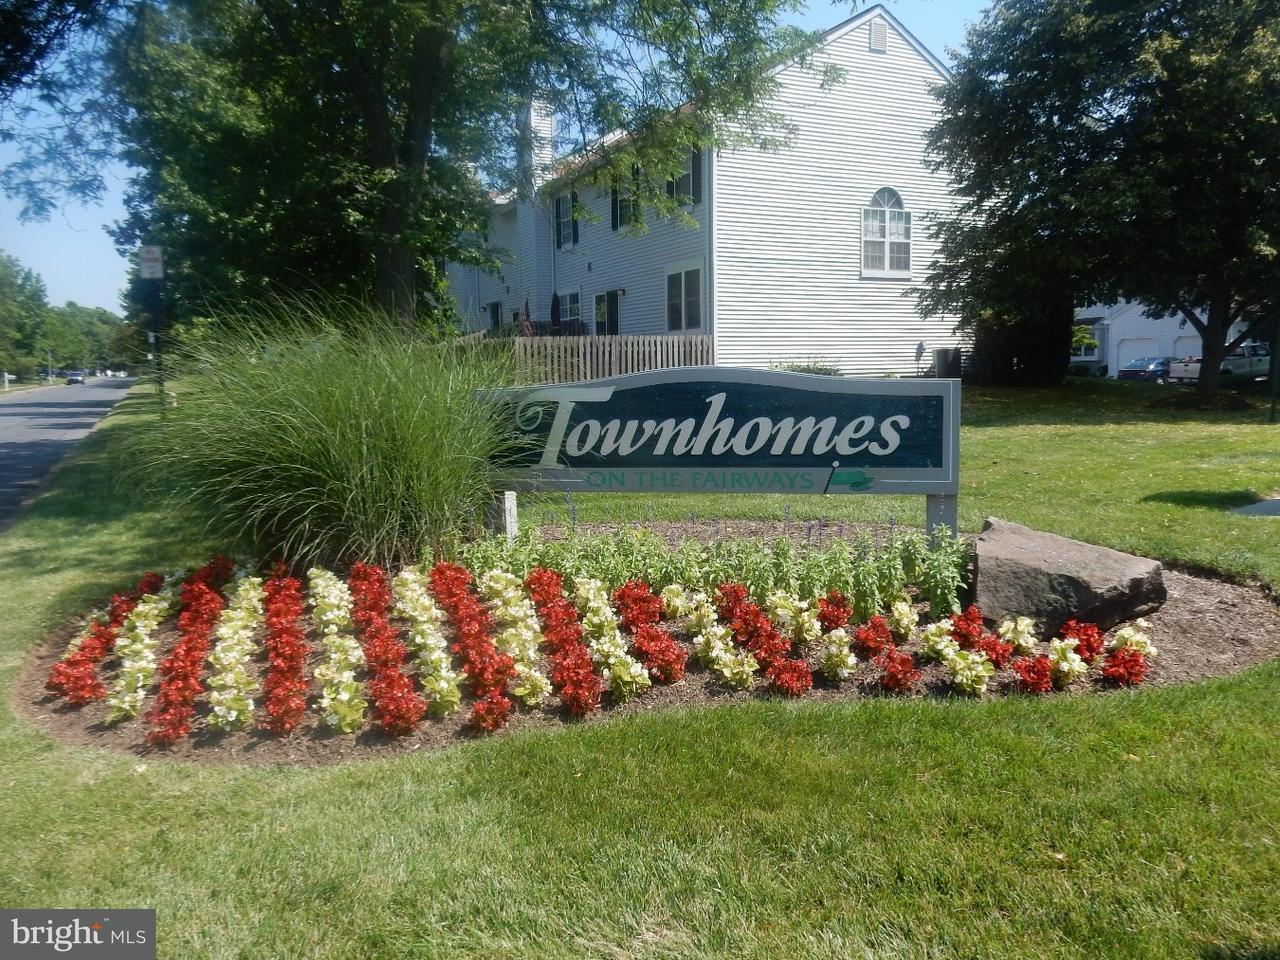 Condominium for Rent at 2432 LINKSMAN LN #A5 Warrington, Pennsylvania 18976 United States